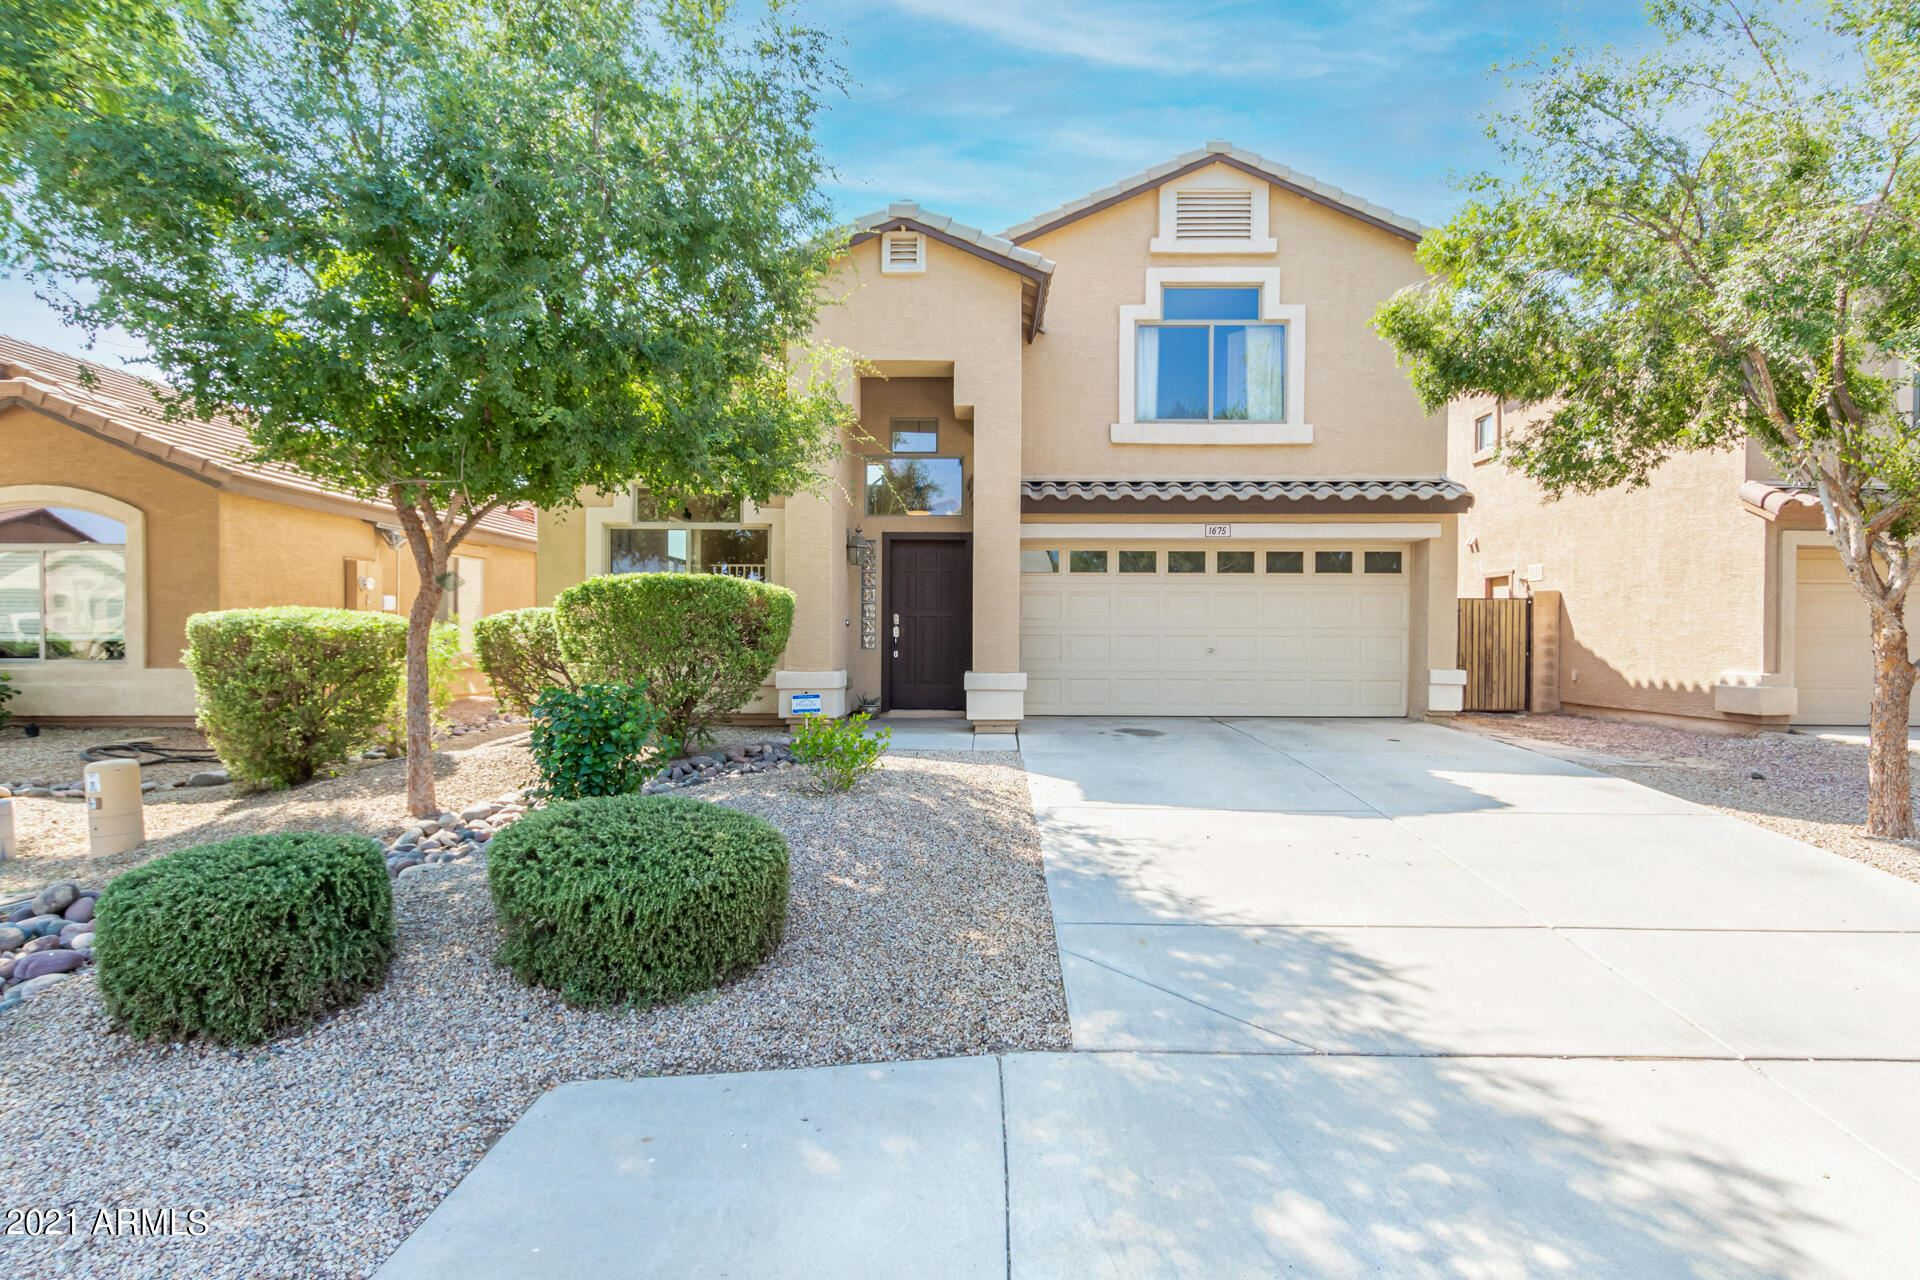 Photo of 1675 E KEITH Avenue, San Tan Valley, AZ 85140 (MLS # 6295473)